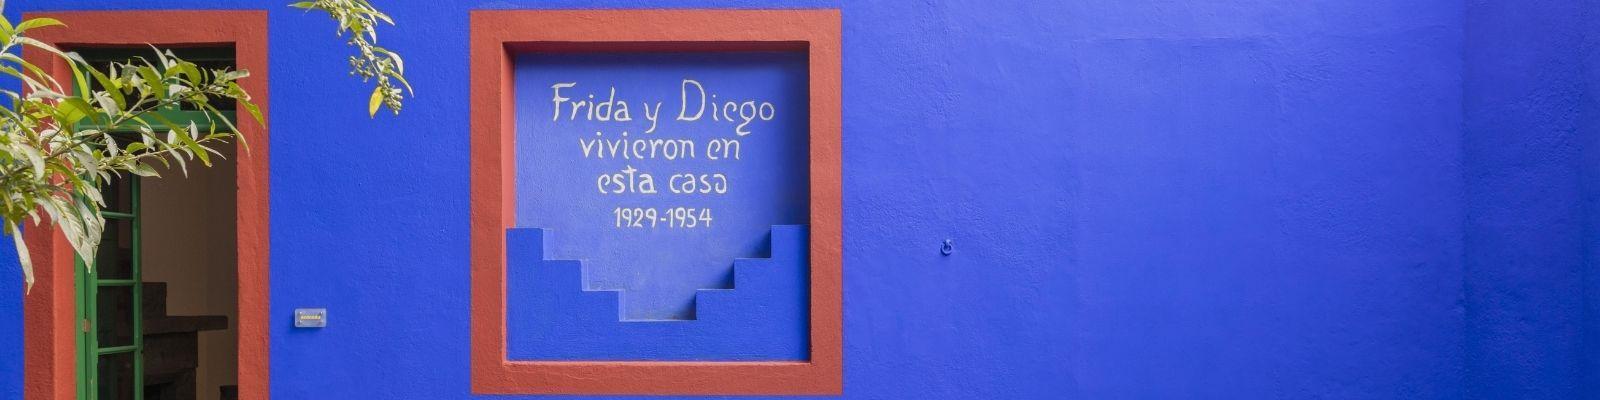 Frida Kahlo's Mexico City